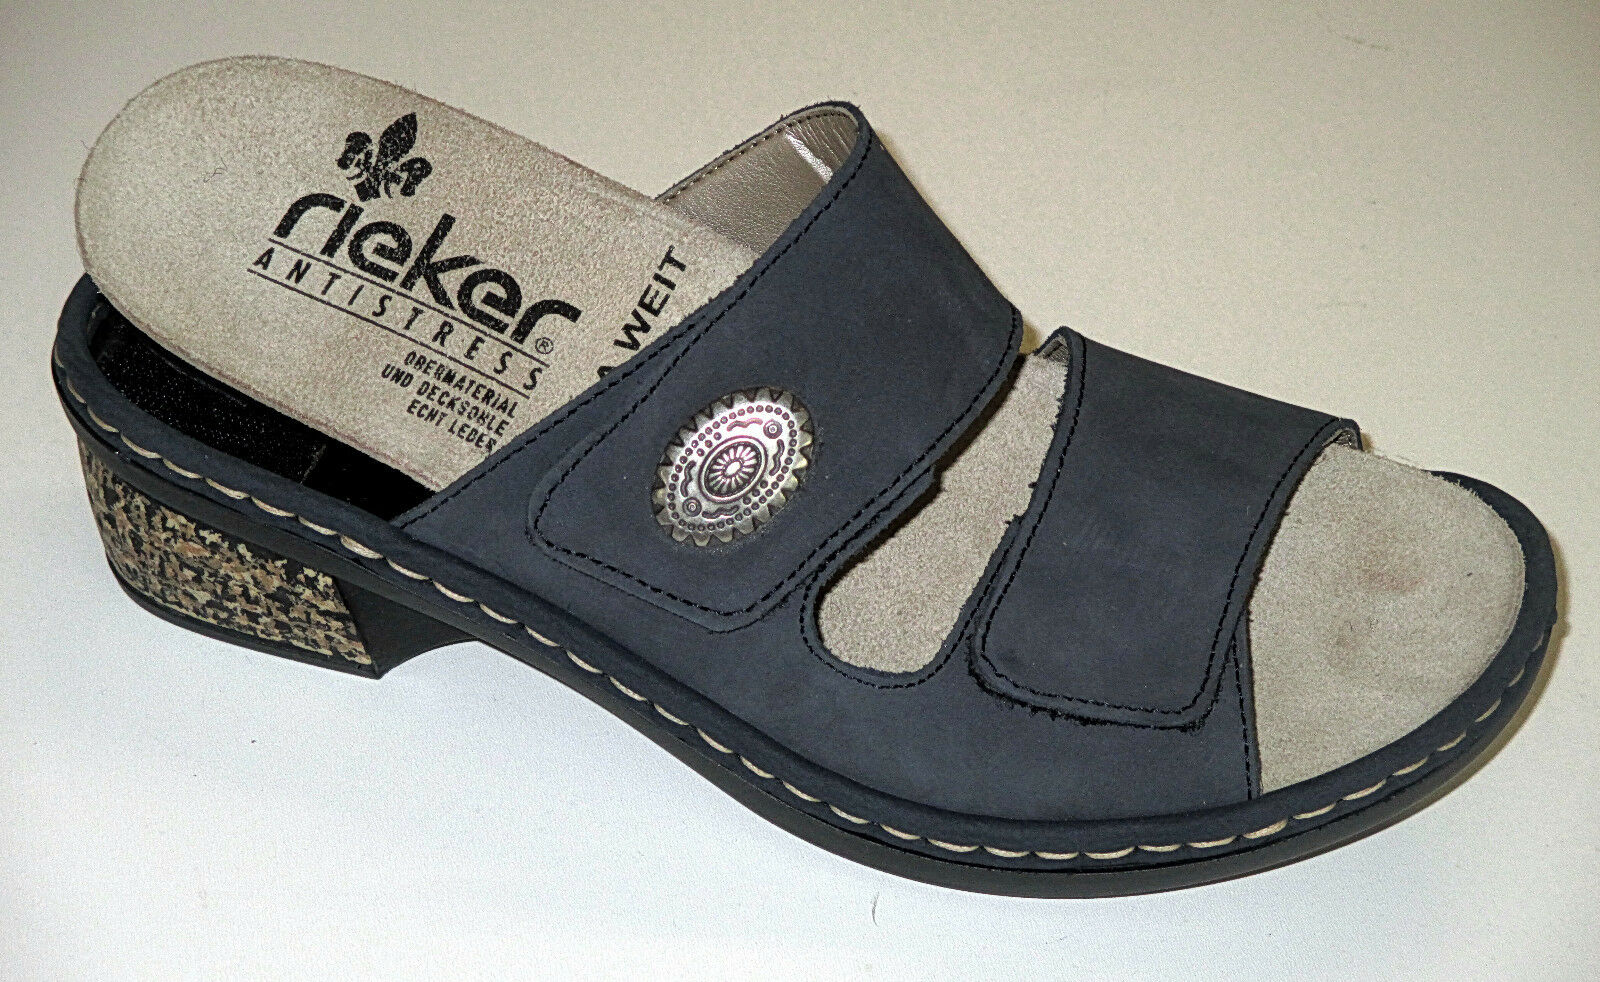 Rieker Schuhe Damen Pantolette  mit herausnehmbare Innensohle, Gr. 37-40, +NEU++